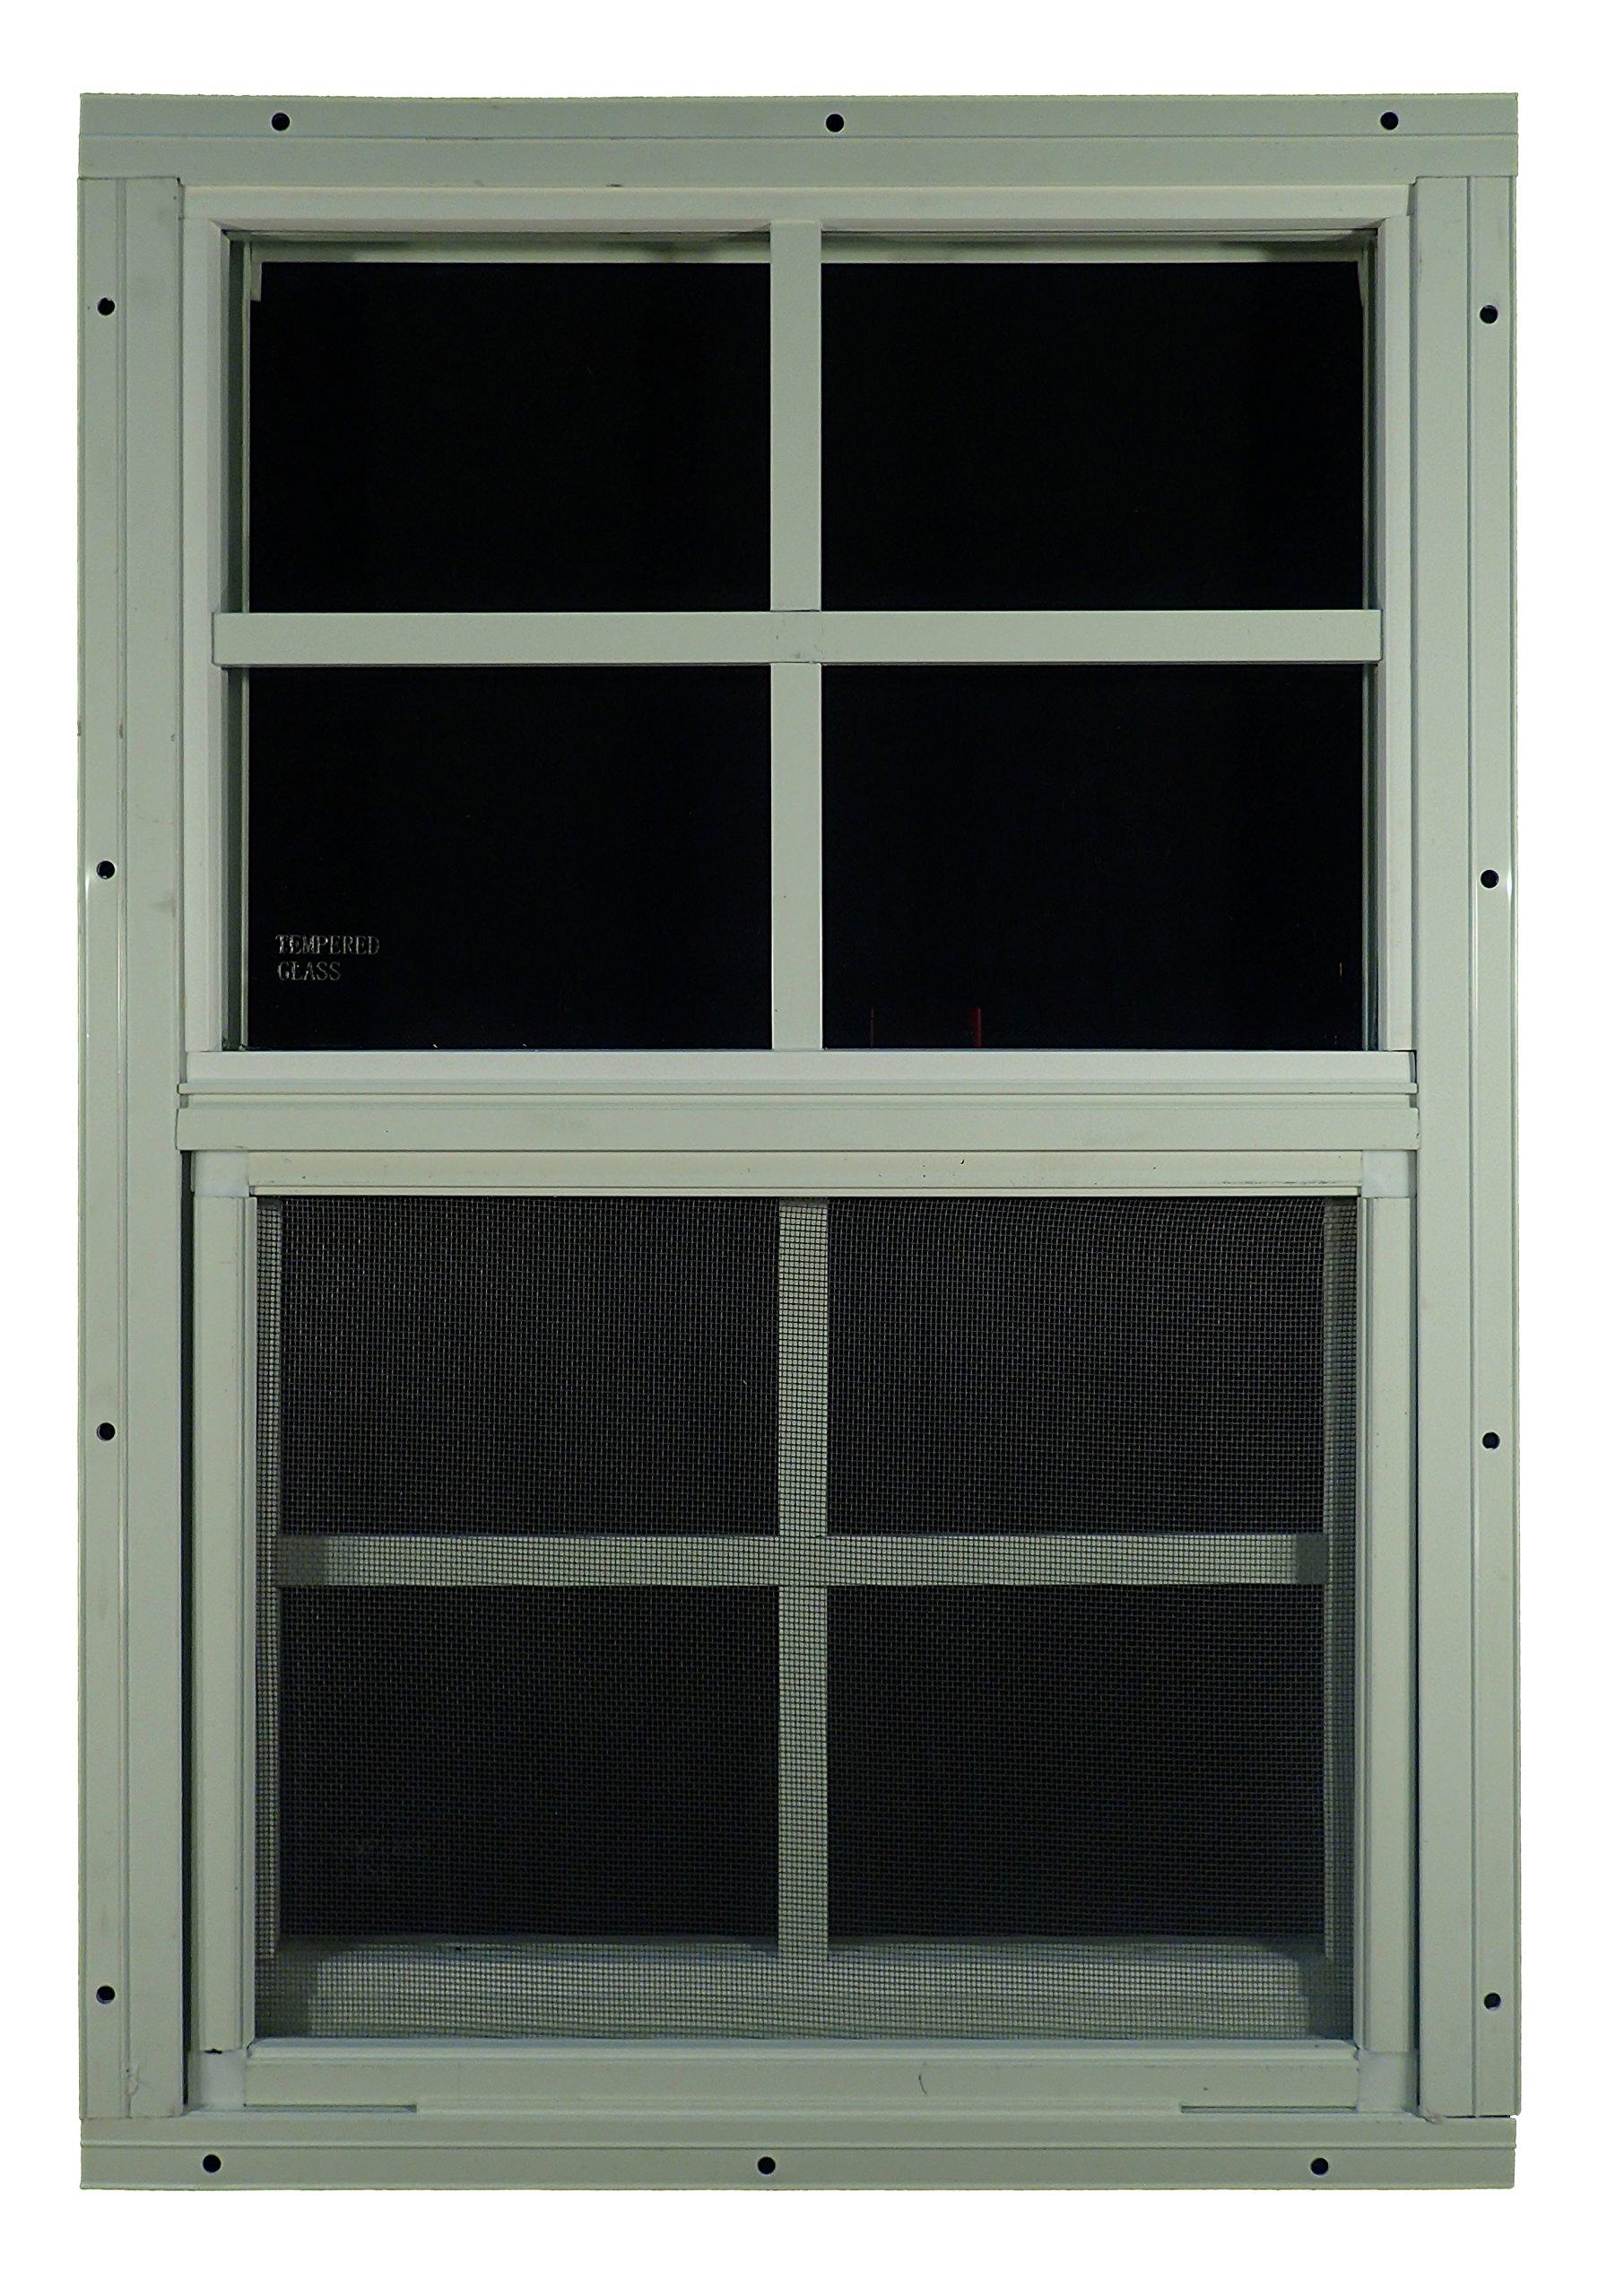 Shed Windows 14'' W x 21'' H - Flush Mount w/ Safety Glass - Playhouse Windows (White)